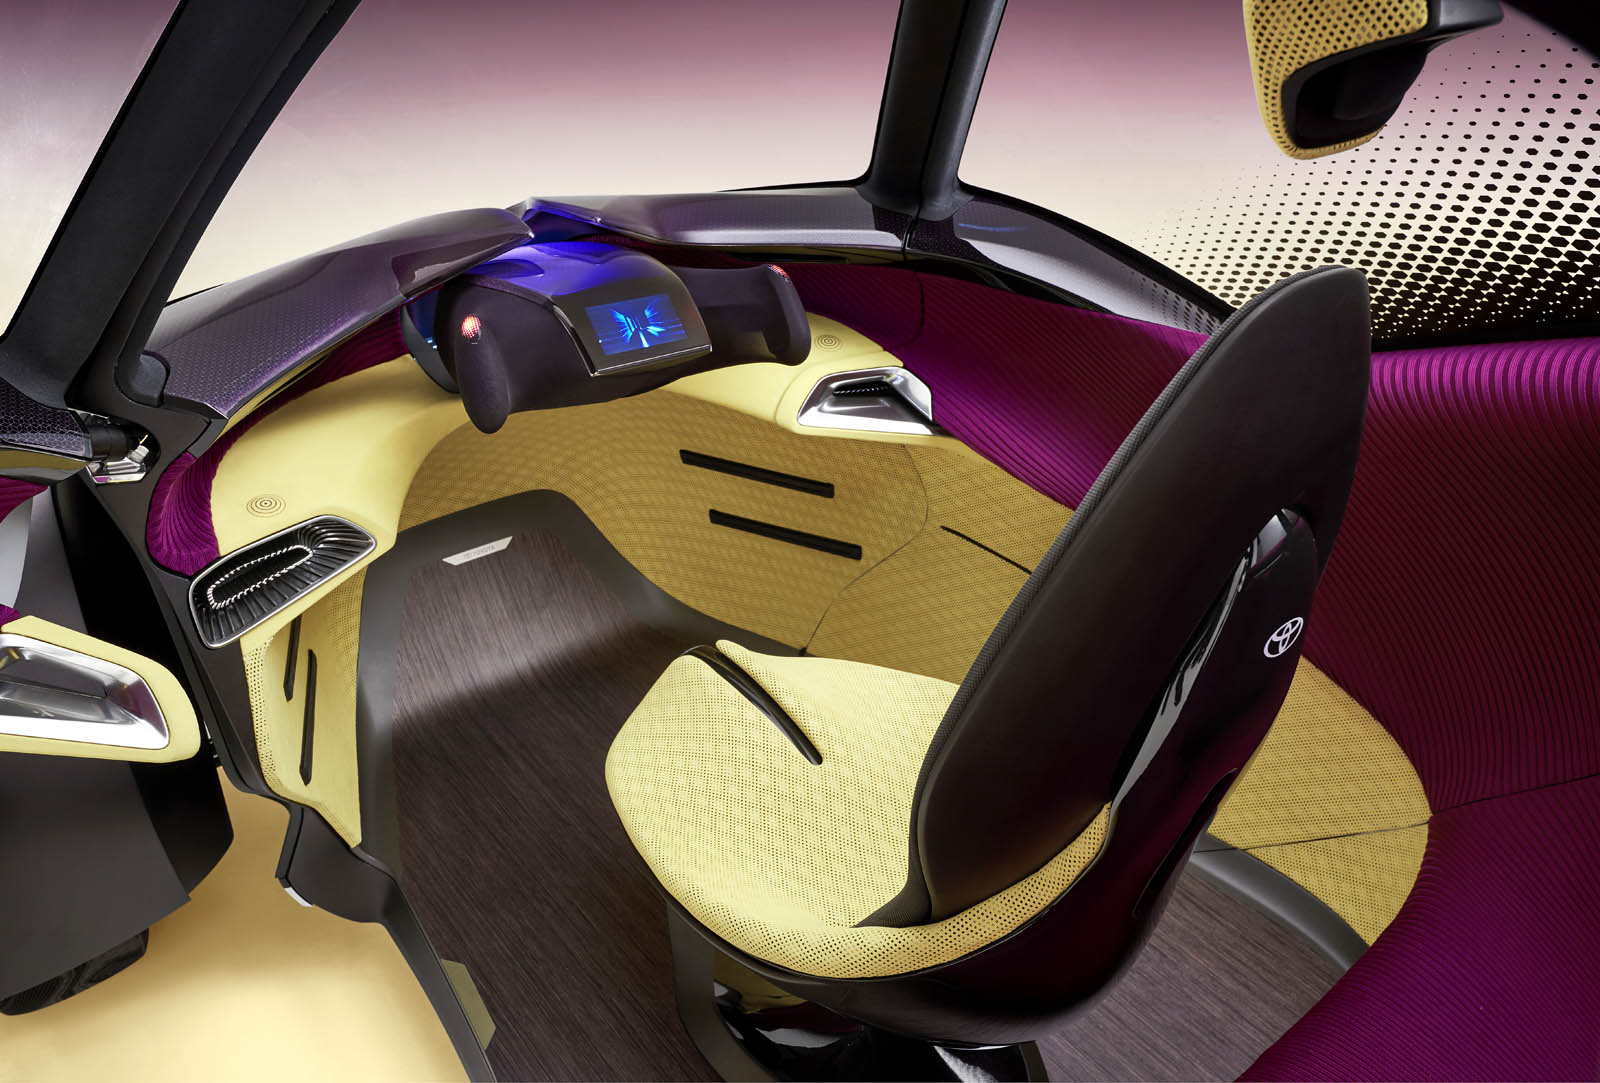 2017_Toyota_Concept_i-Tril_InteriorDet_04 copy